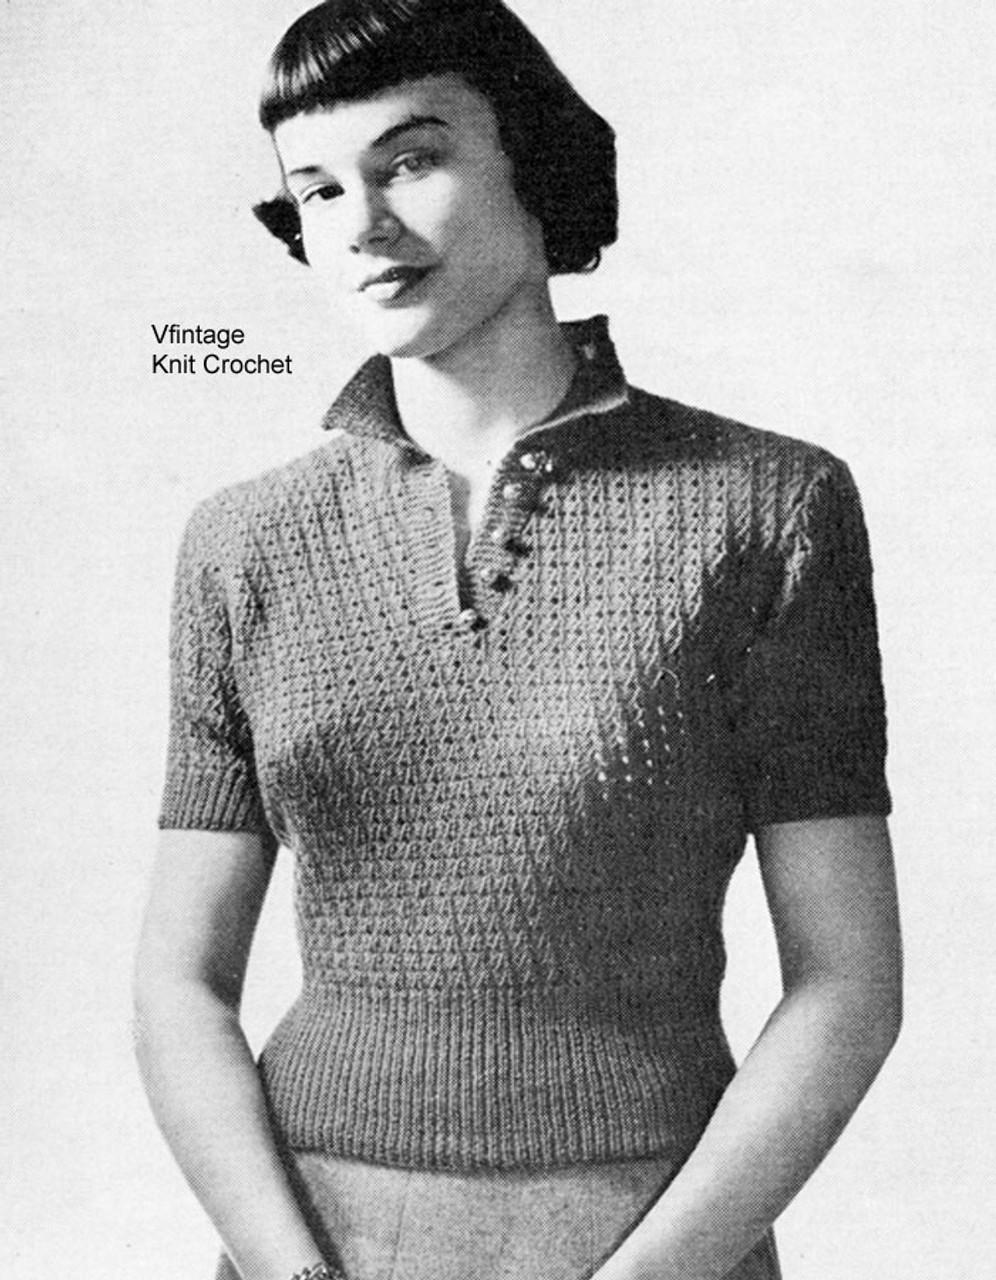 Knitting Short Sleeve Top Pattern, Vintage 1947